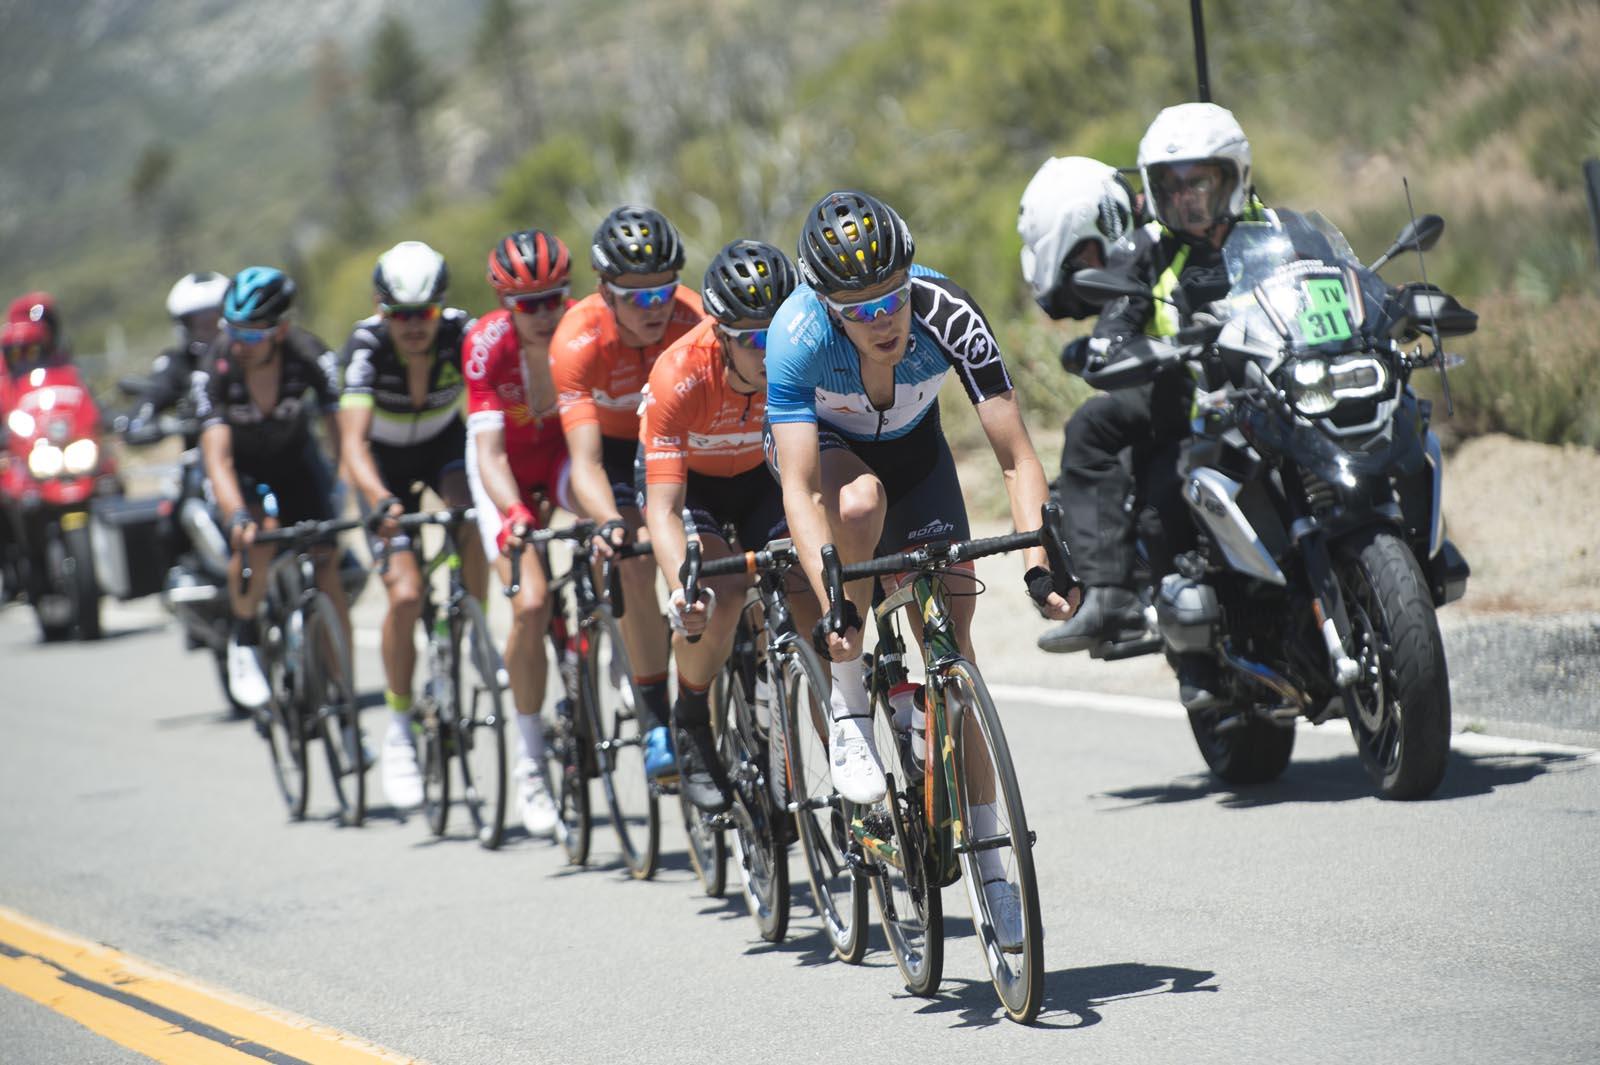 Tour of California Stage 7 Breakaway